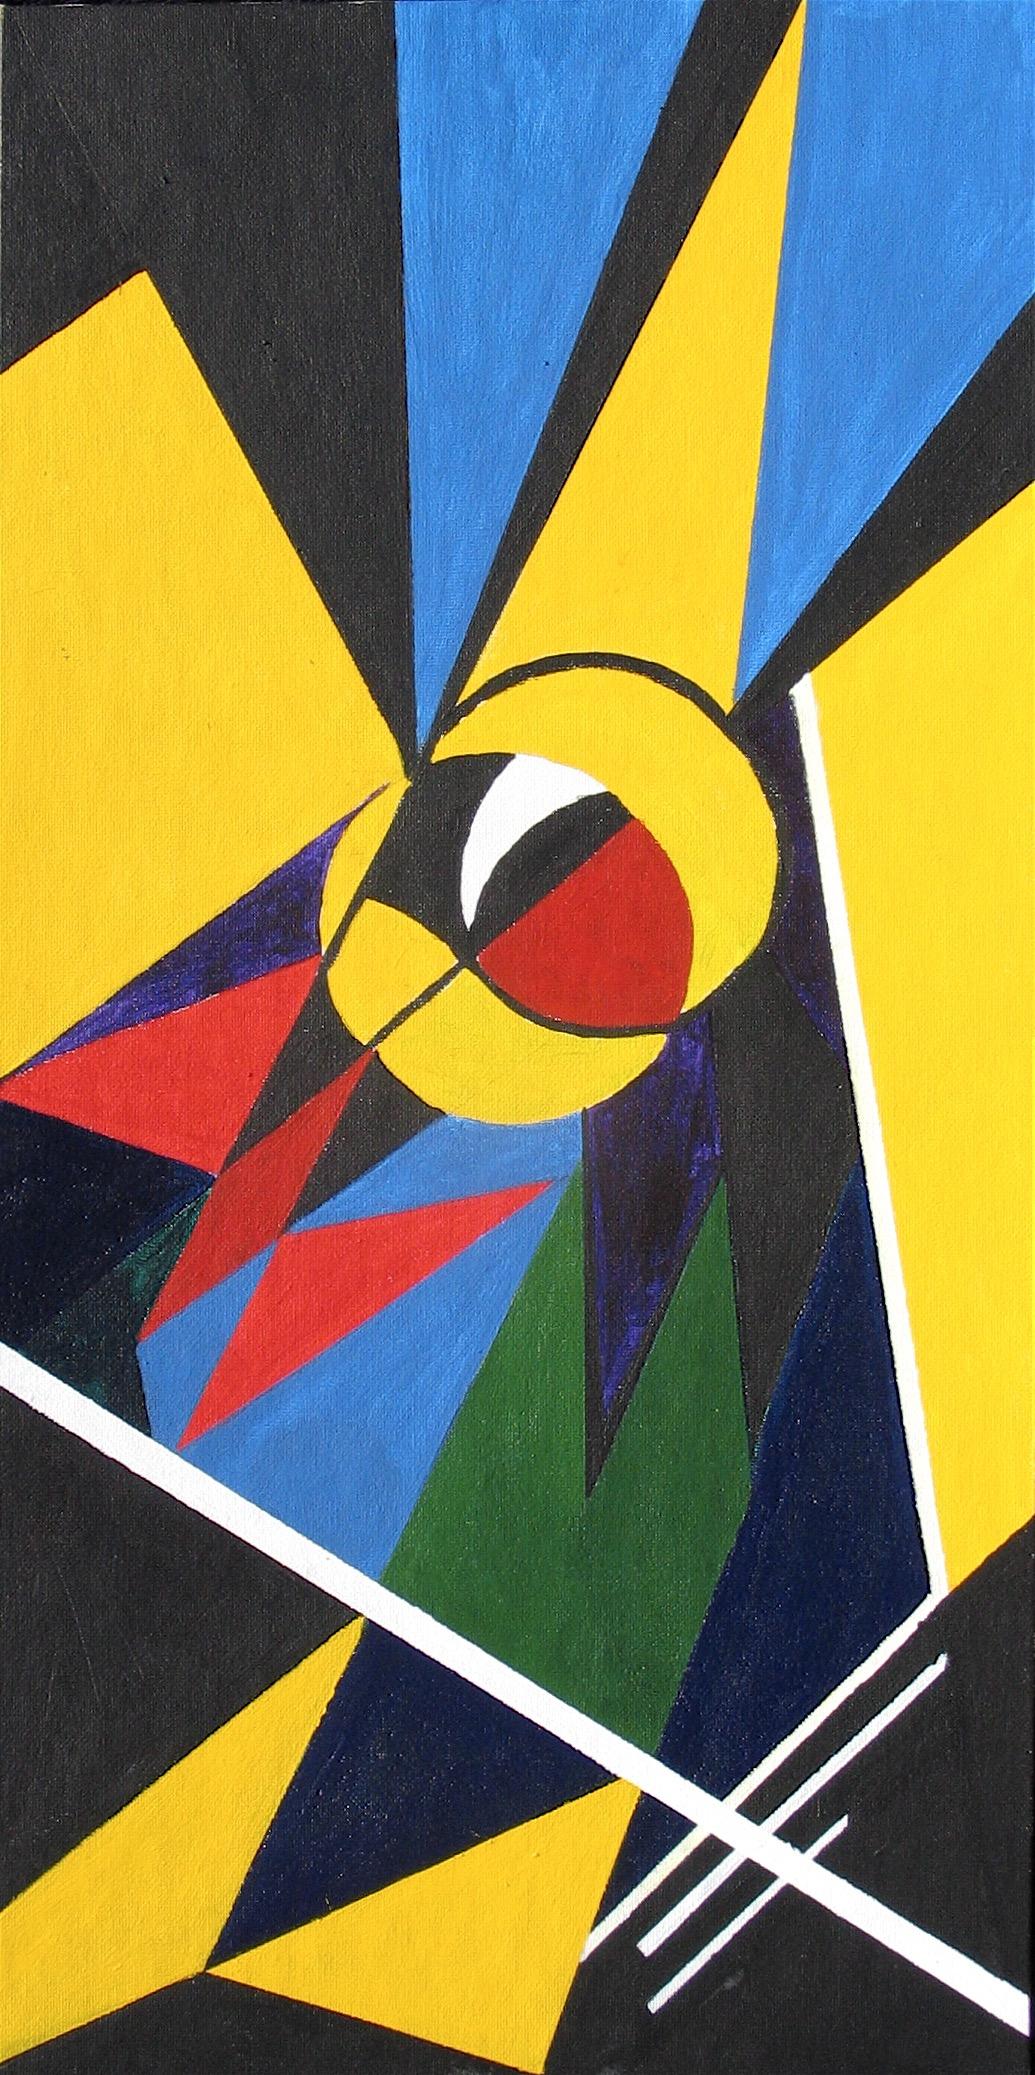 Bird's Eye : 30 X 61 cm acrylic on board